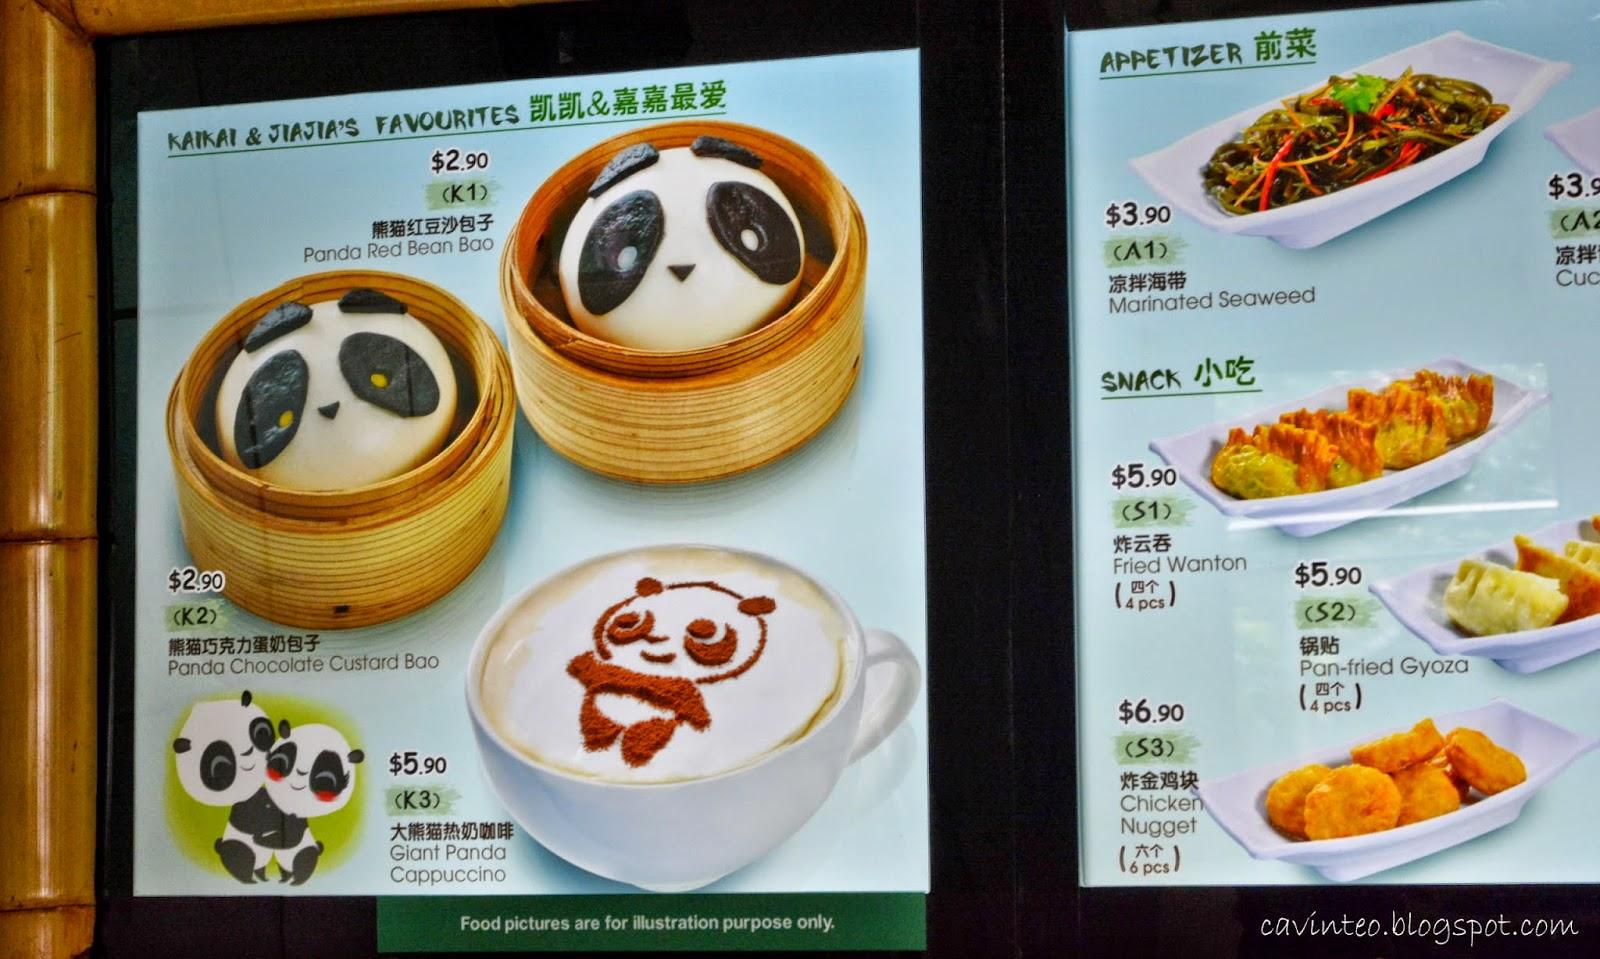 Entree Kibbles: Mama Panda Kitchen (熊猫妈妈小吃)   The Expensive Panda Themed  Fast Food Restaurant @ River Safari [Singapore]